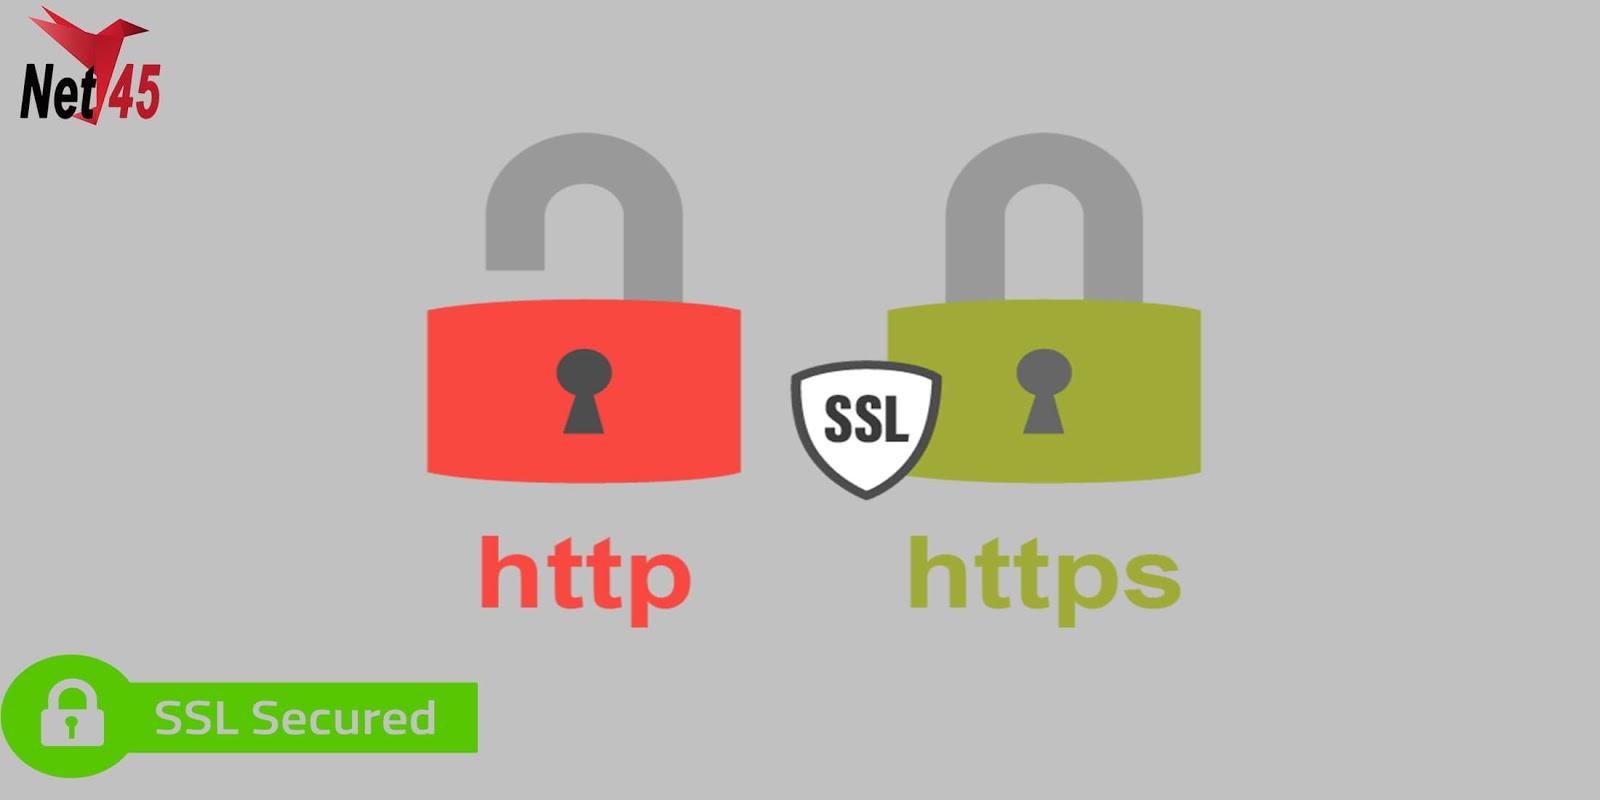 ssl,what is ssl,ssl certificate,how ssl works,how does ssl work,what is tls,what is one way ssl,what is two way ssl,install ssl,what is a ssl cert,ssl encryption,what is ssl in hindi,how ssl works hindi,what is an ssl certificate,what is an ssl certificate?,whats is ssl in hindi,ssl tls,what is ssl certificate,how to work with ssl,what is ssl certificate in tamil